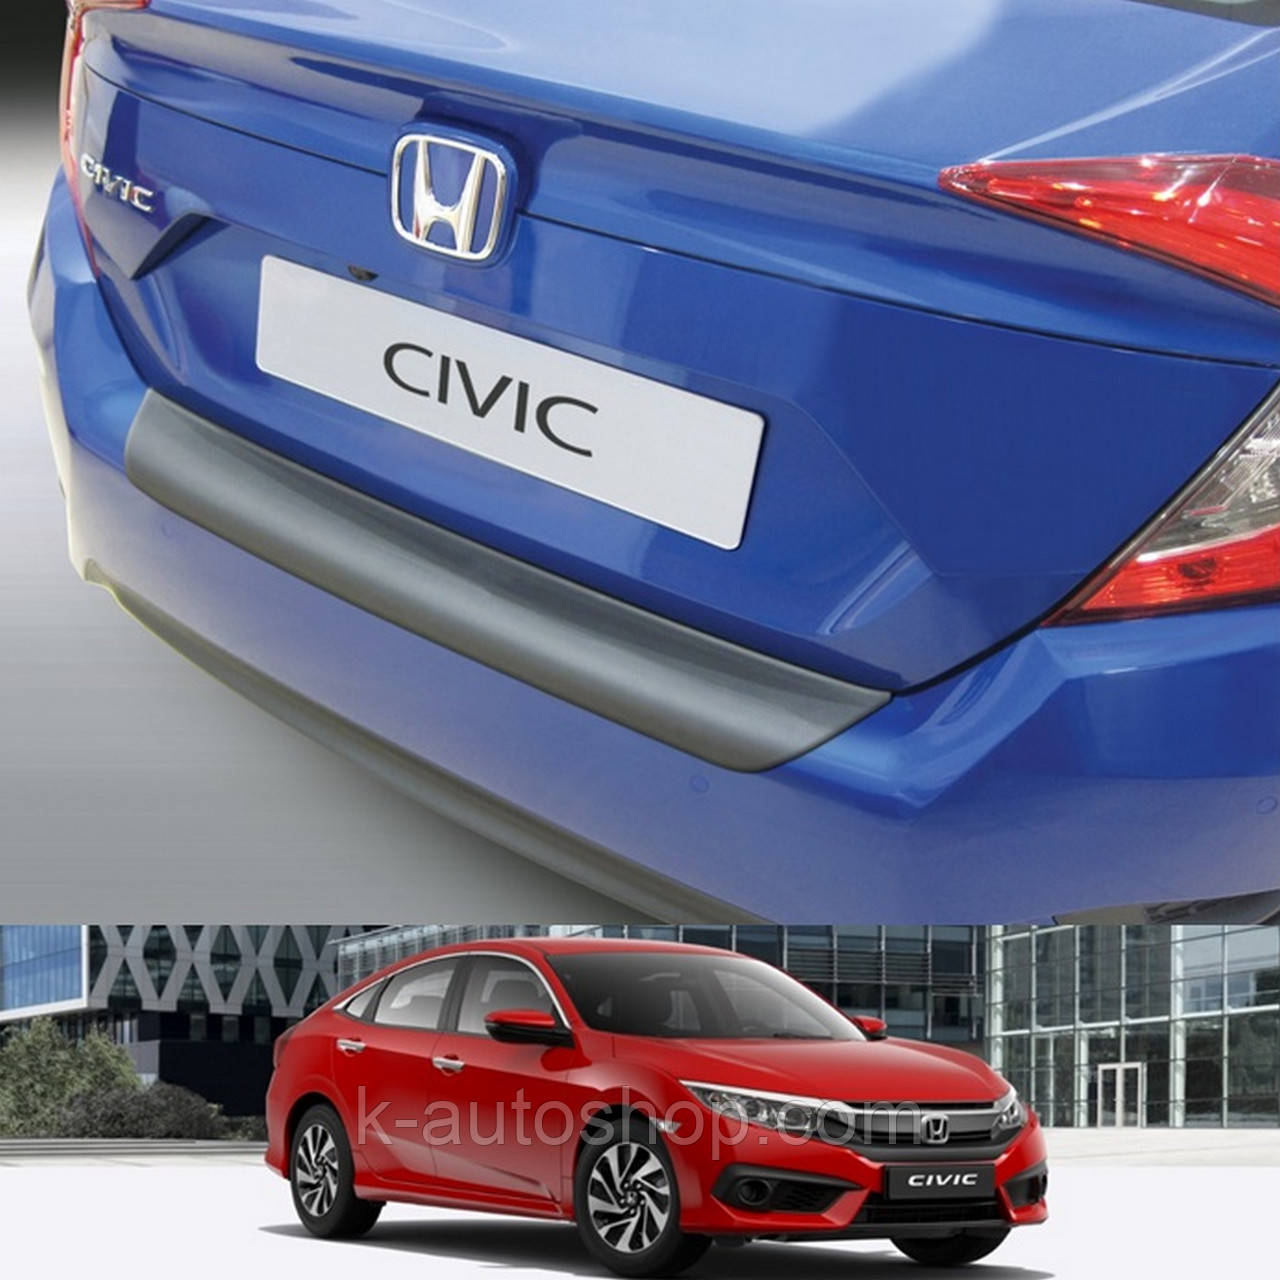 Пластикова захисна накладка на задній бампер для Honda Civic Mk10 SE/EX 4door sedan 2017+